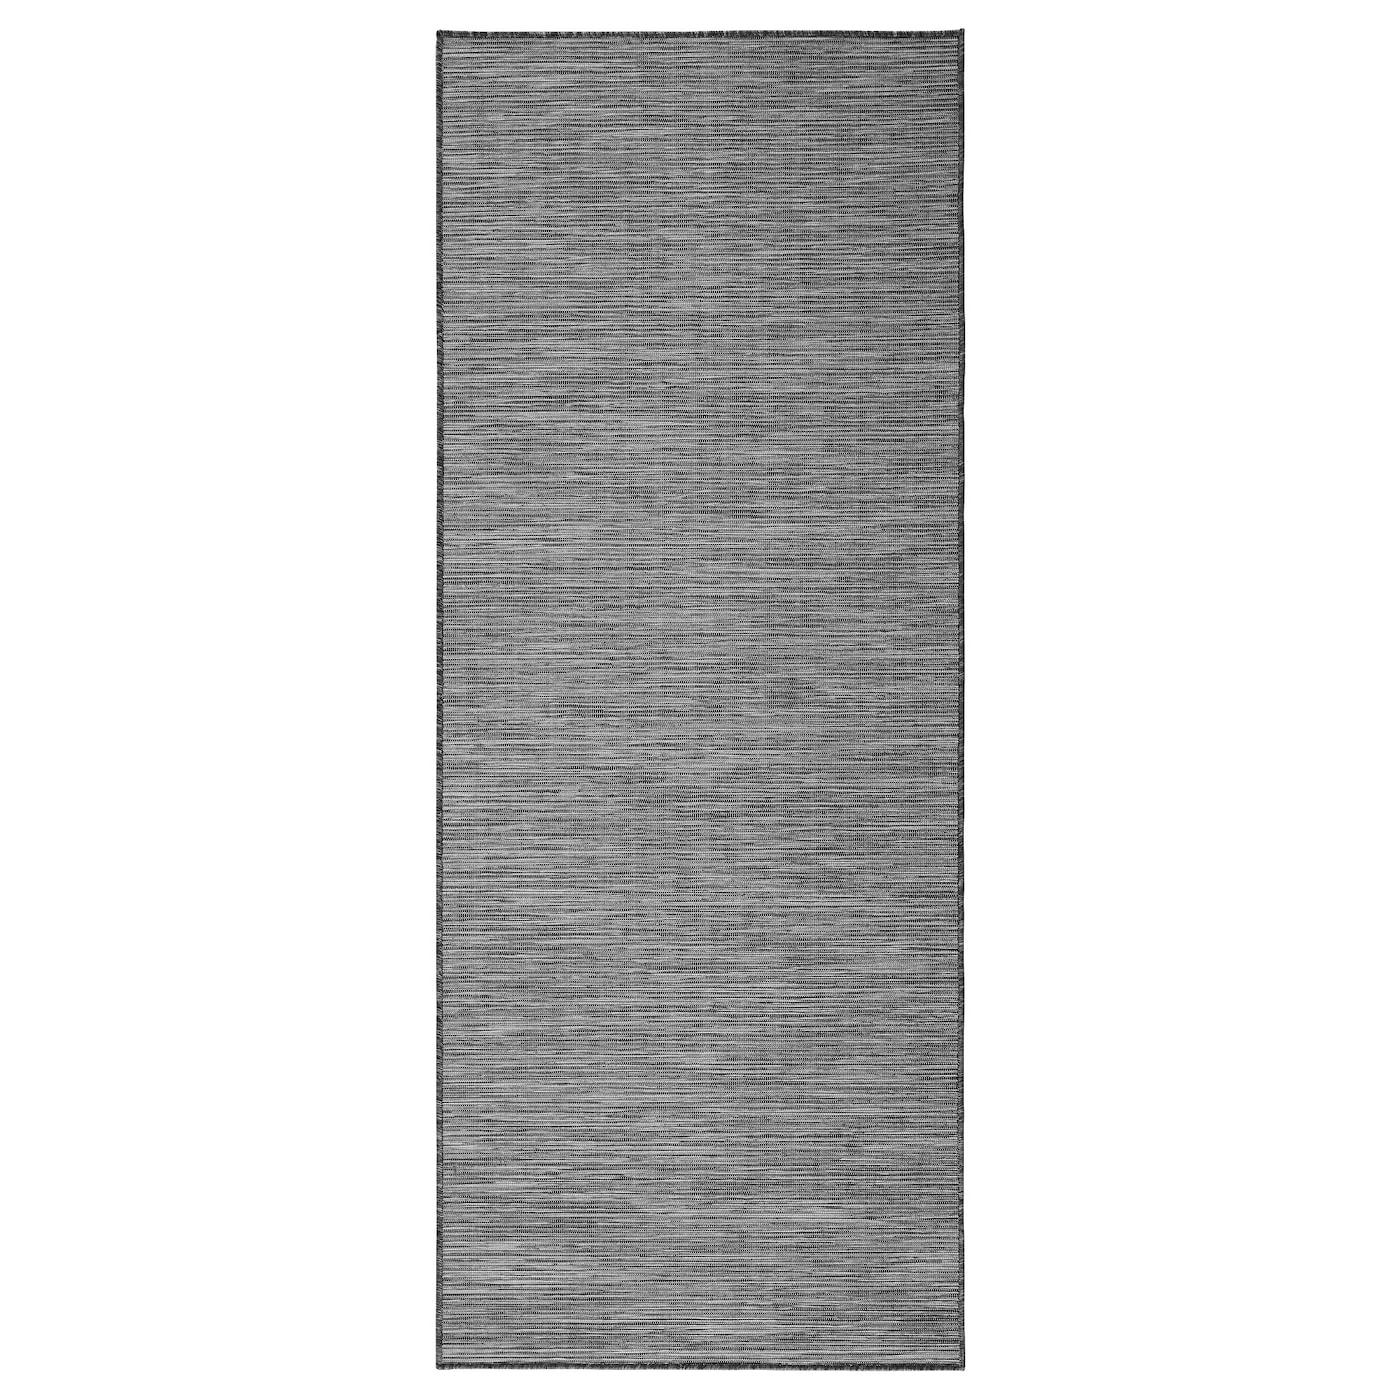 Hodde alfombra int exterior gris negro 80 x 200 cm ikea - Alfombra gris ikea ...